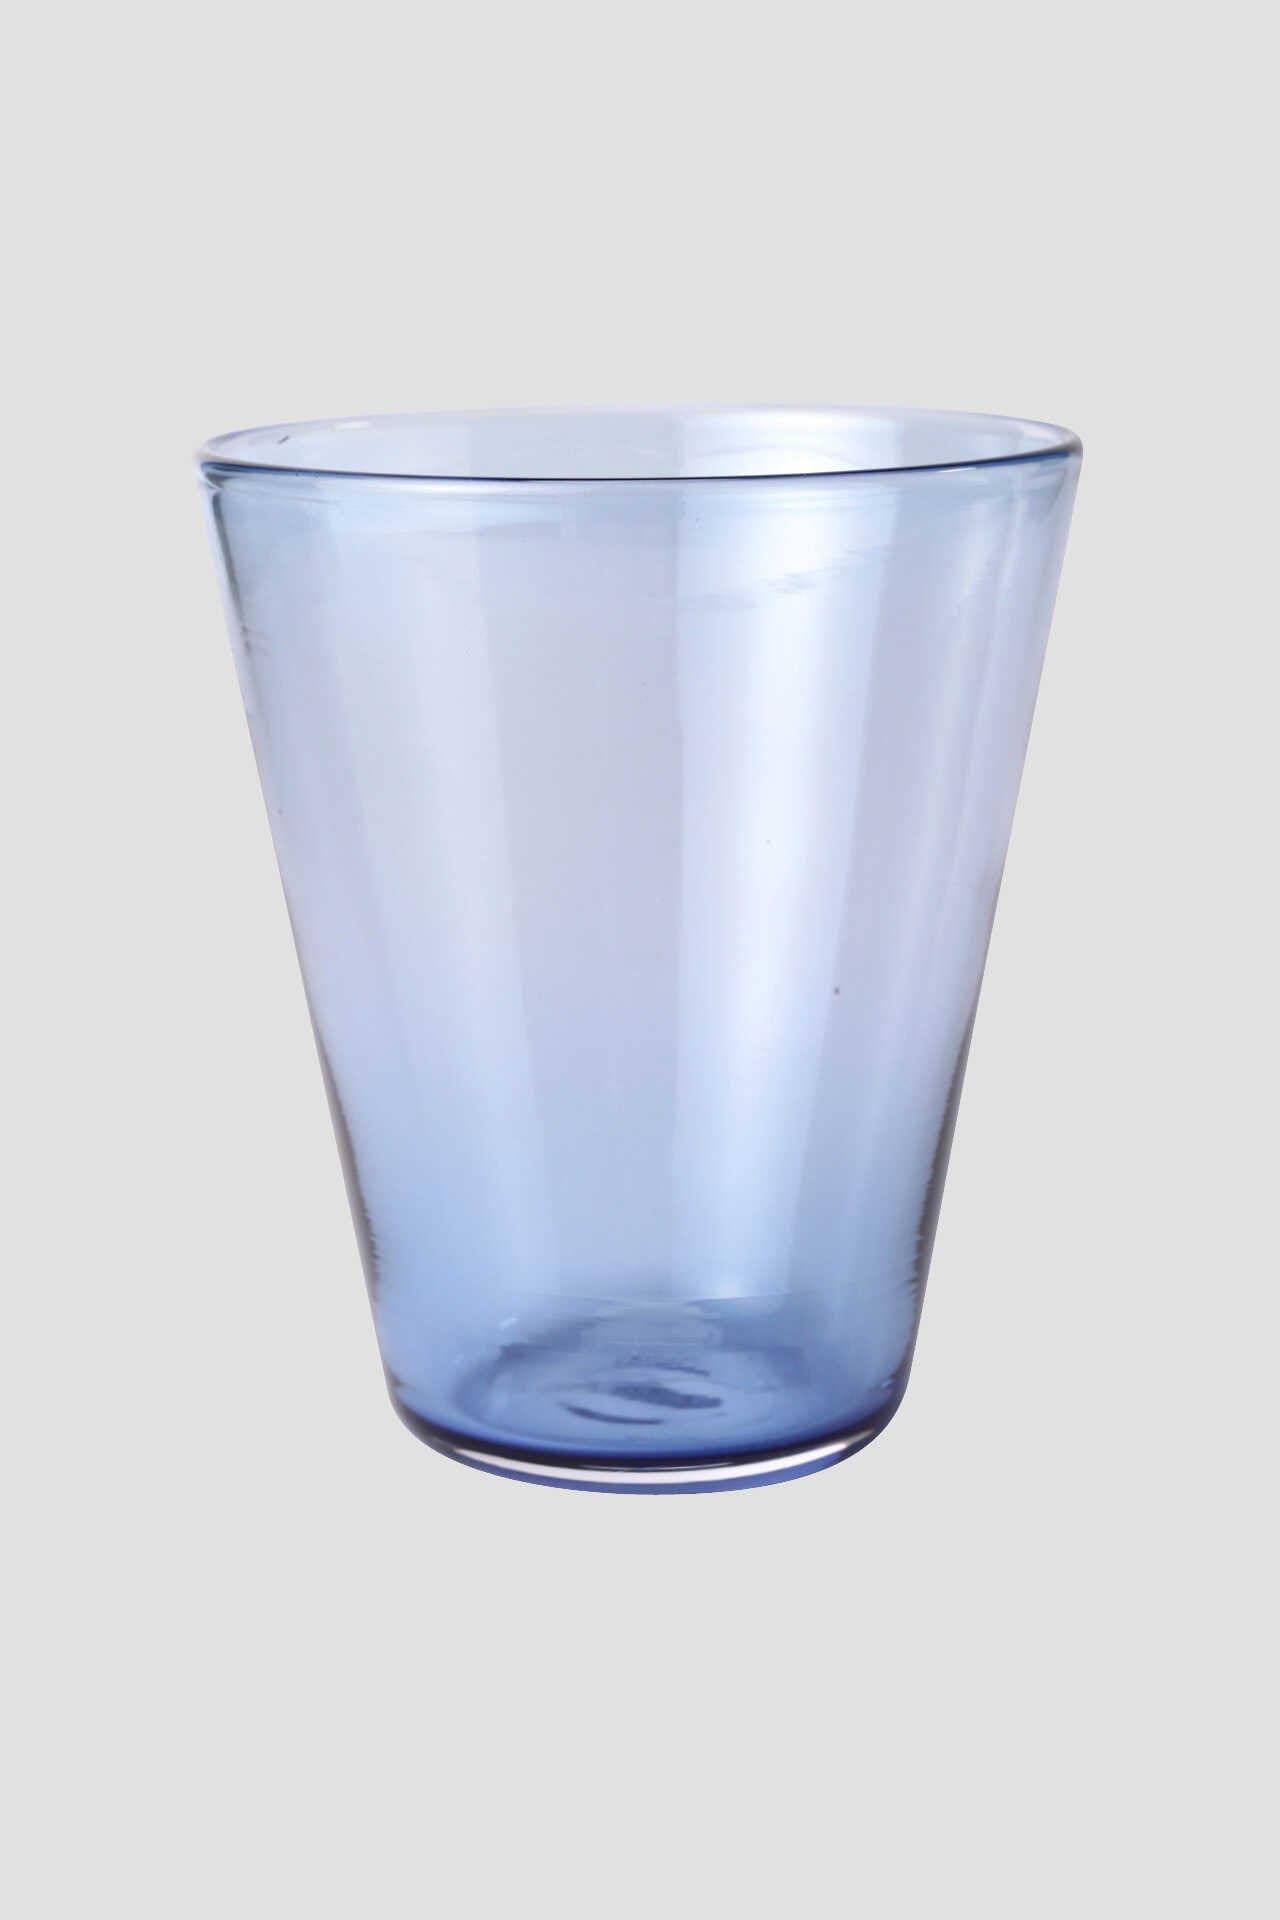 BLOWN GLASS WATER TUMBLER3